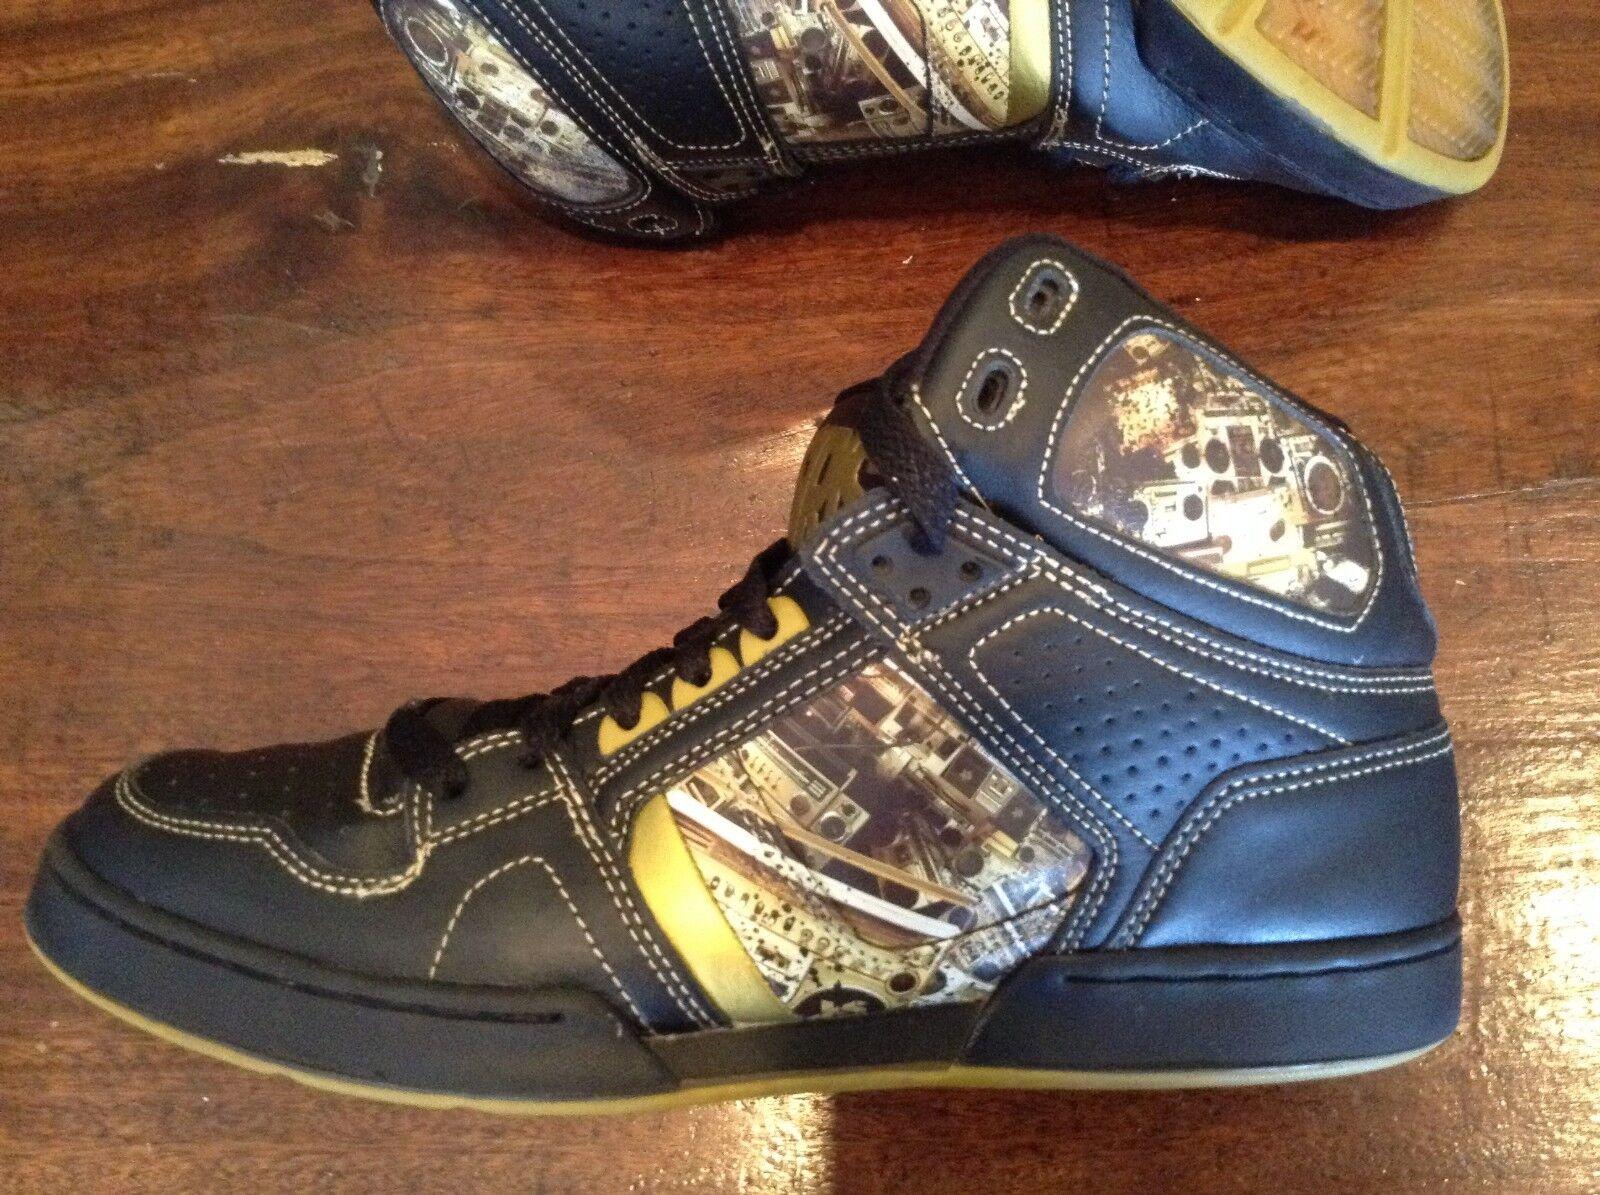 Osiris Exact Science BRONX scarpe Uomo 12 BOOMBOX nero oro oro oro EUC 80s Inspirosso c024c0